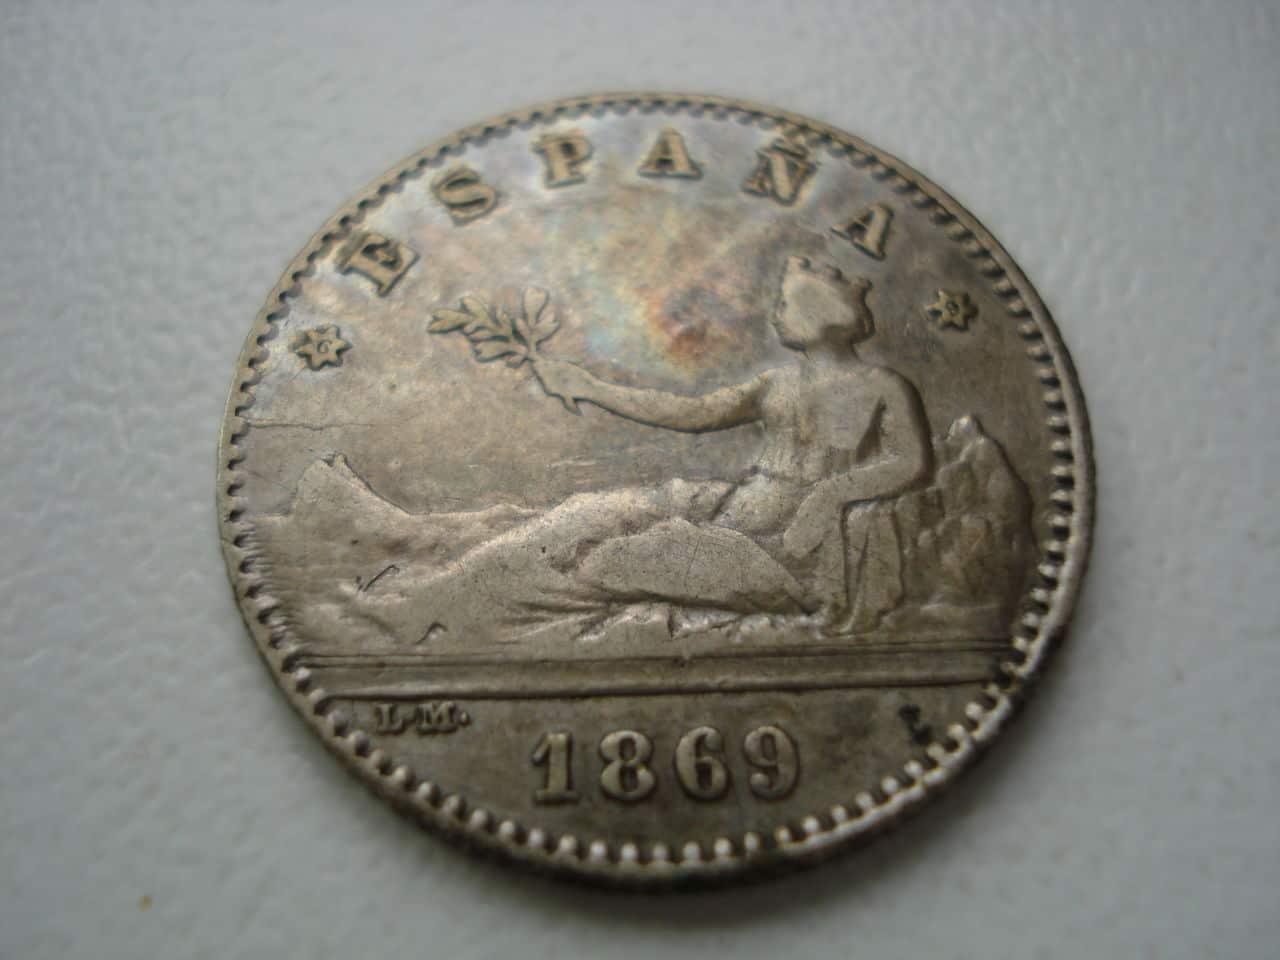 50 céntimos 1869. Gobierno Provisional. Monadas2_006